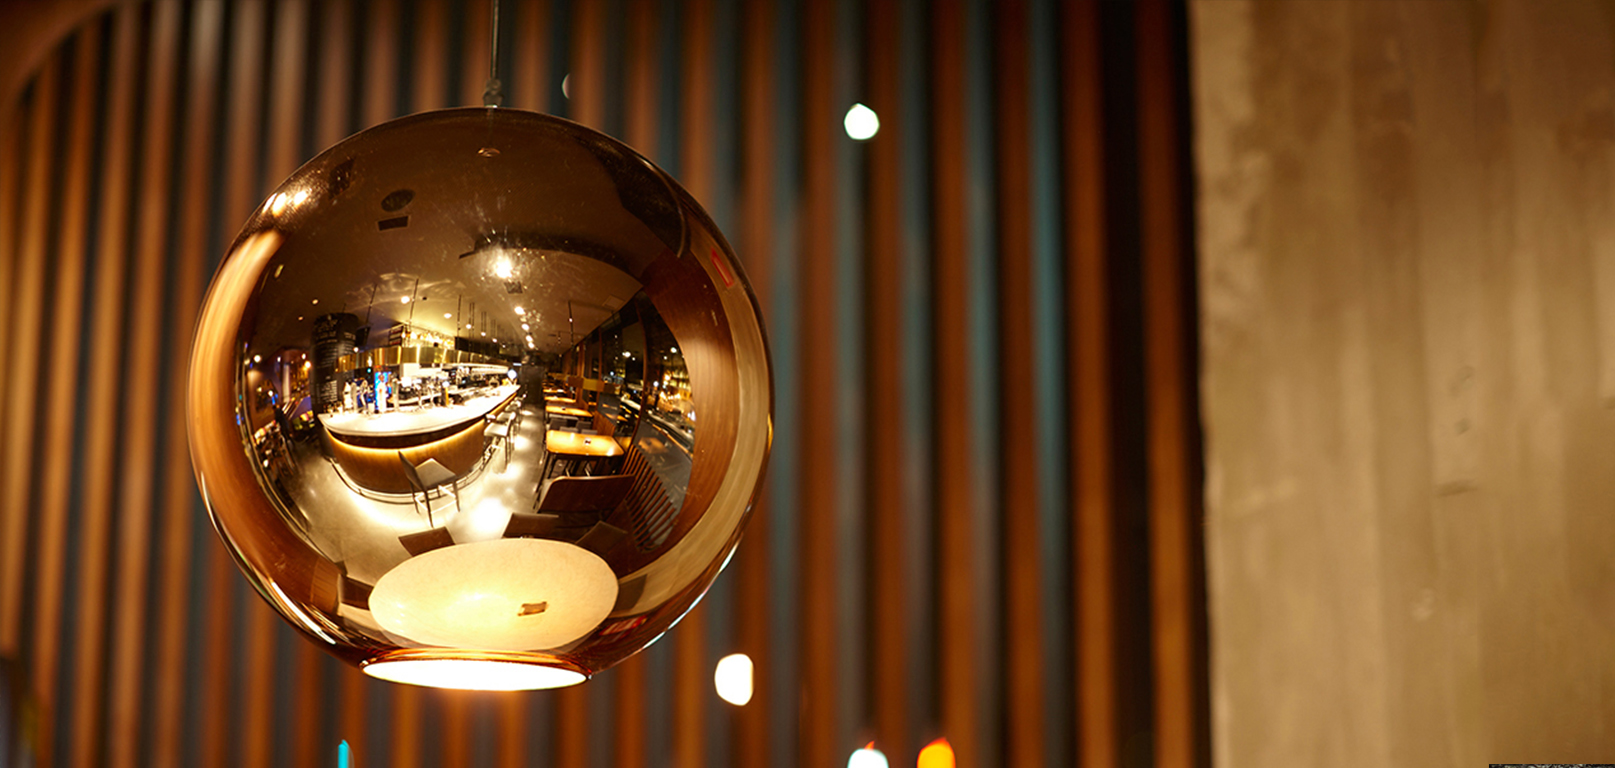 Premierk un diseño de iluminación realizado por Chulavista.